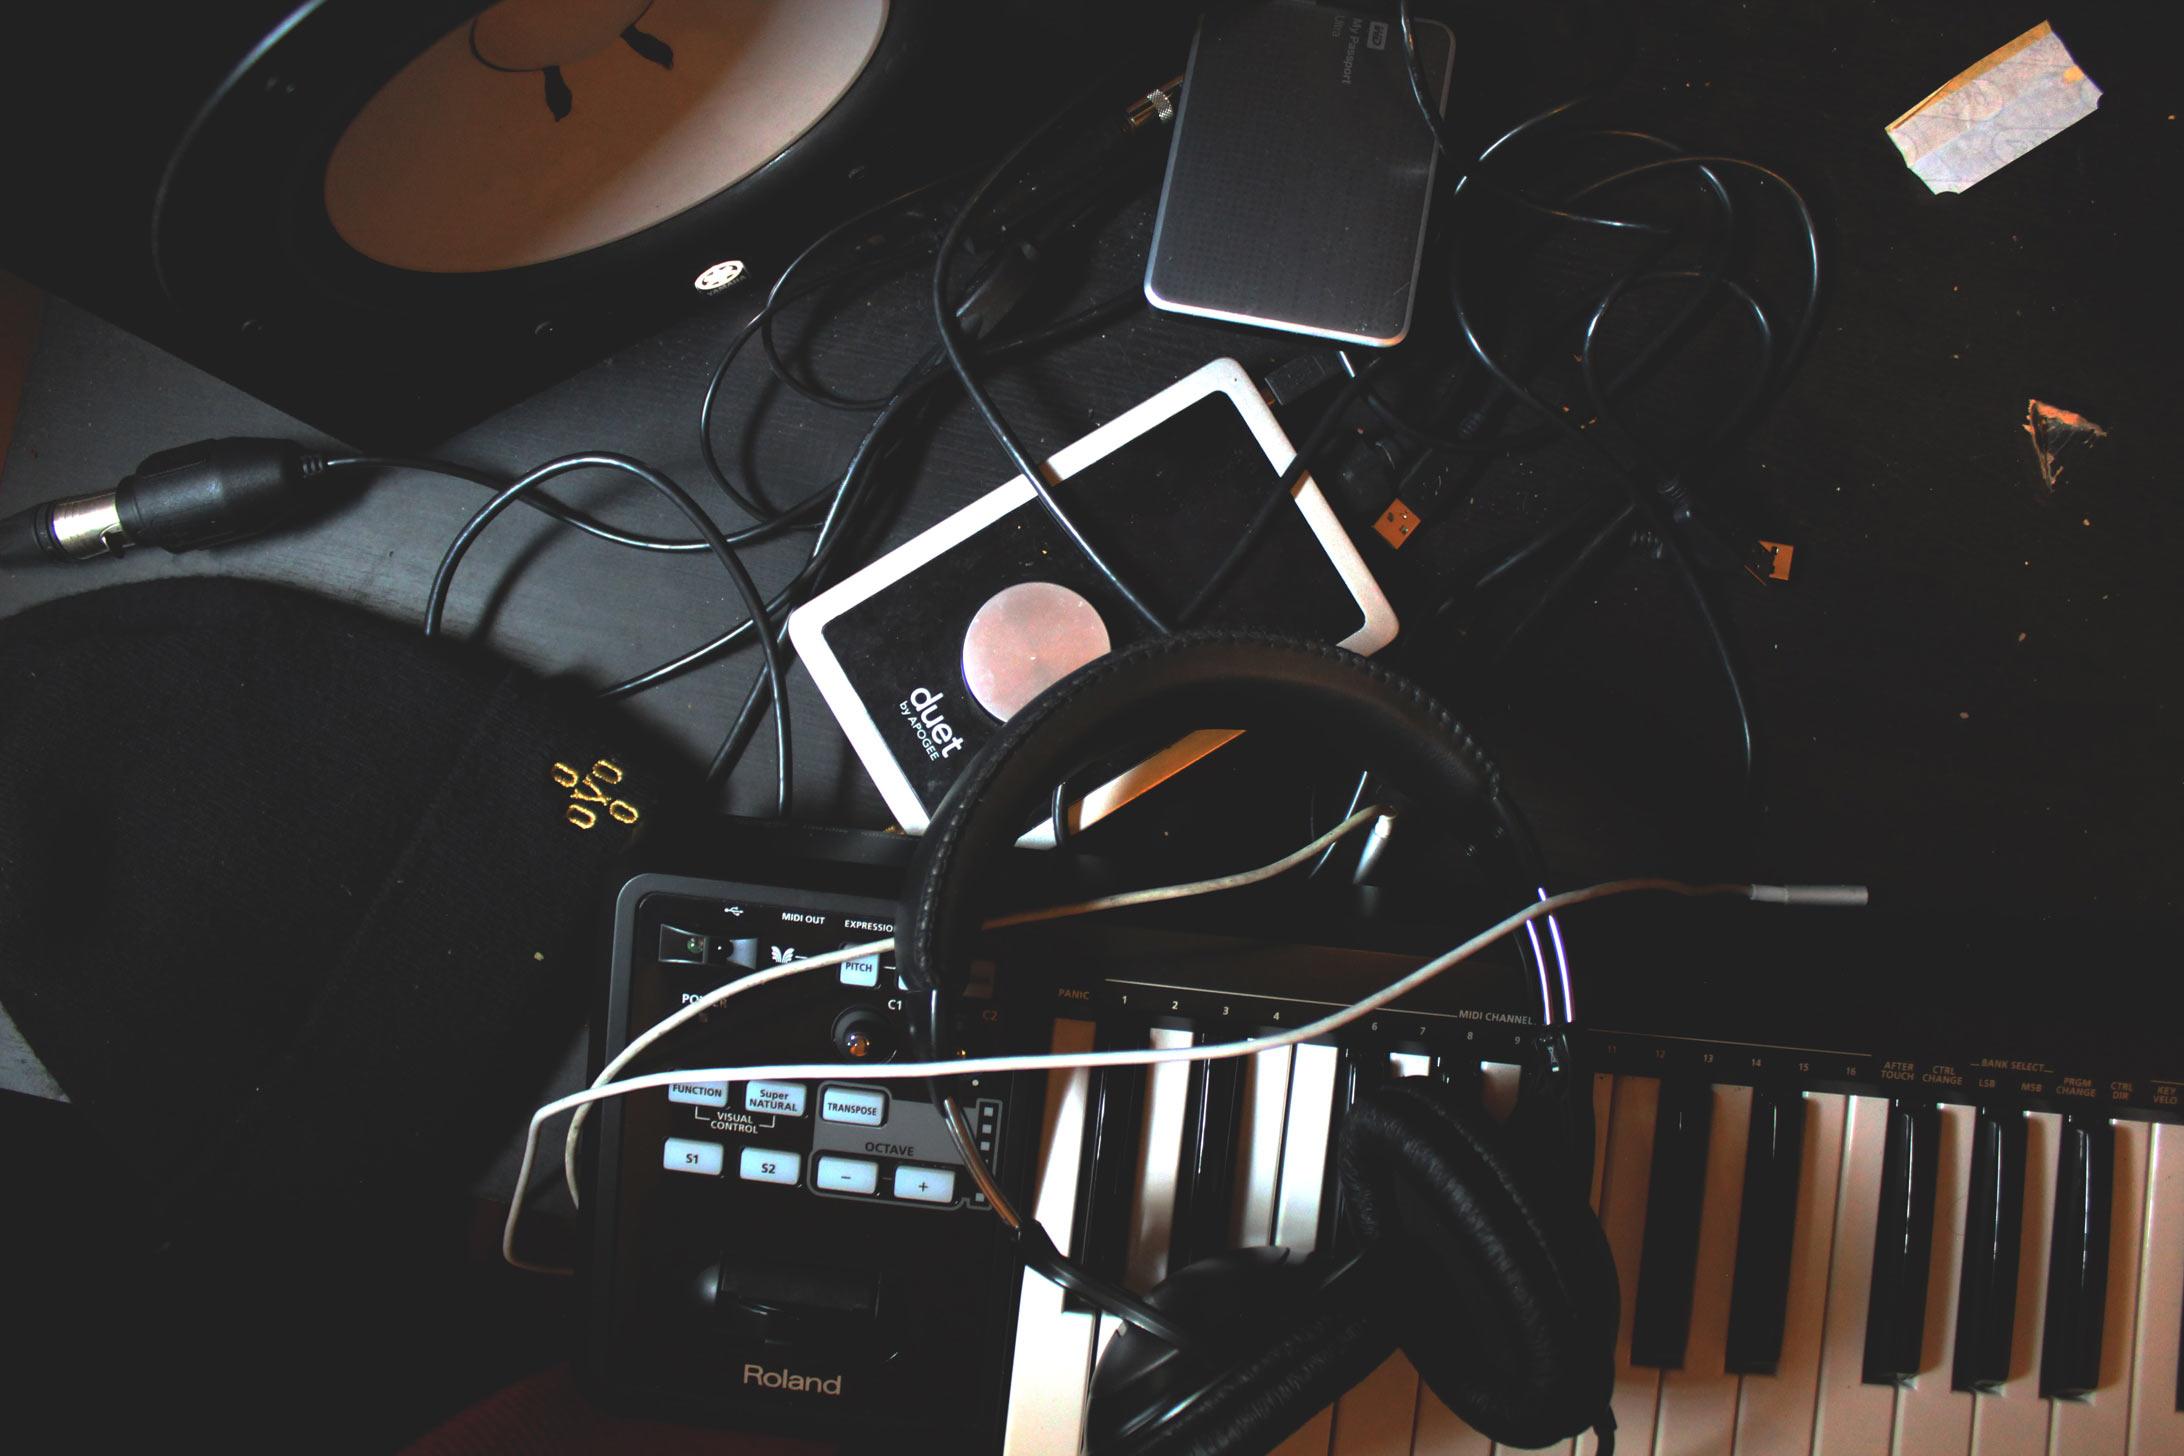 Llenguatge i pràctica musical